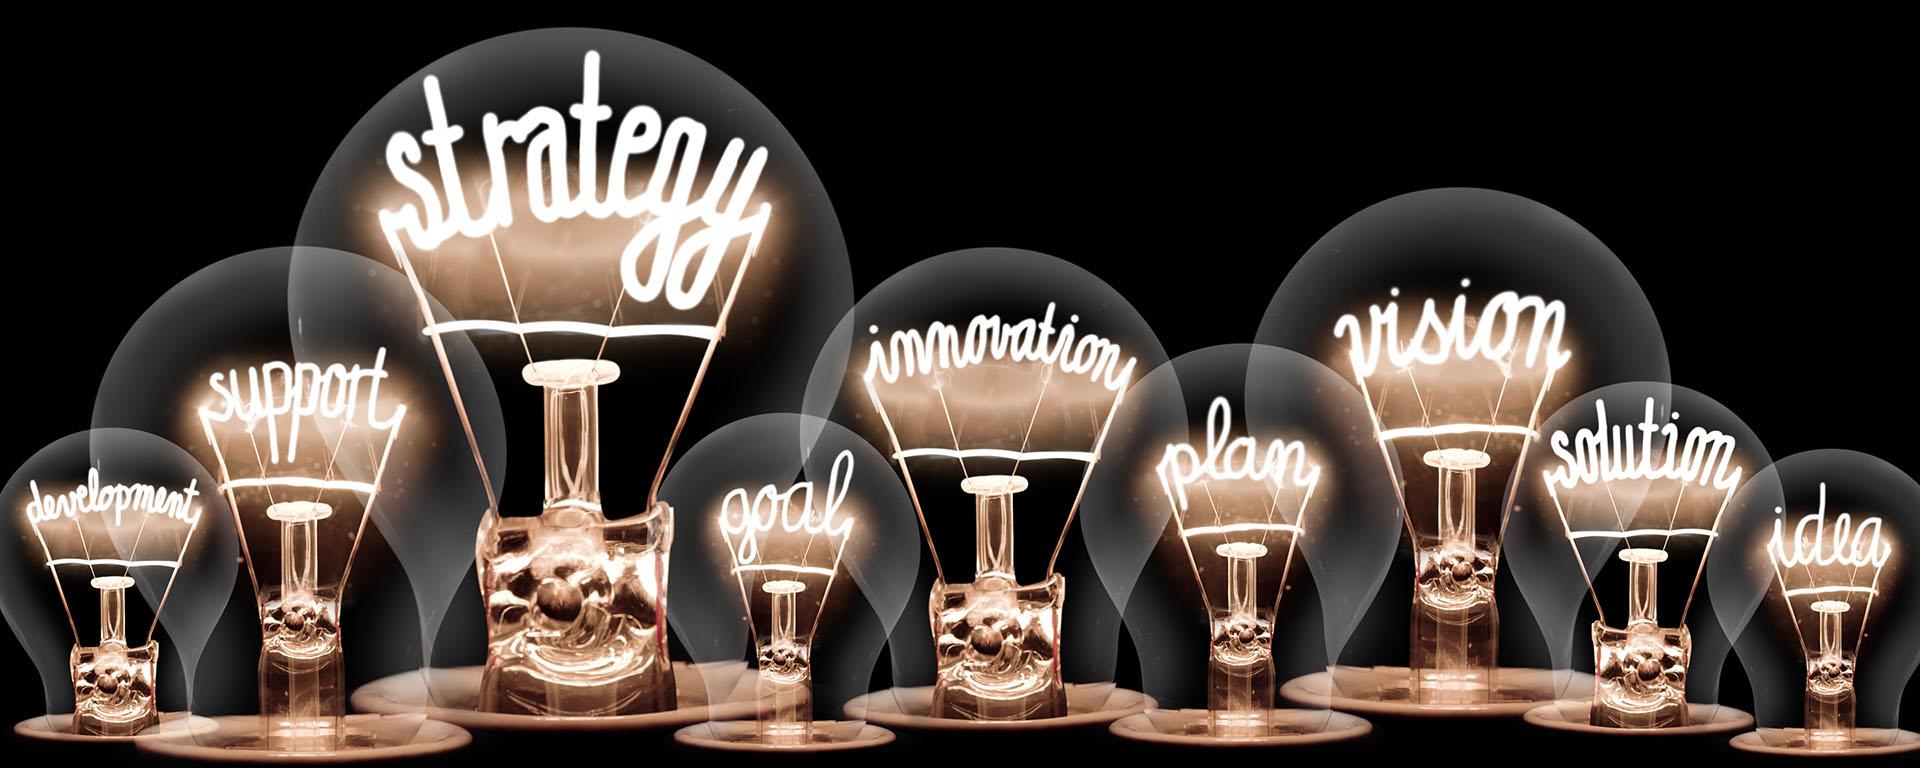 Lightbulbs with Creative Words for Innovation